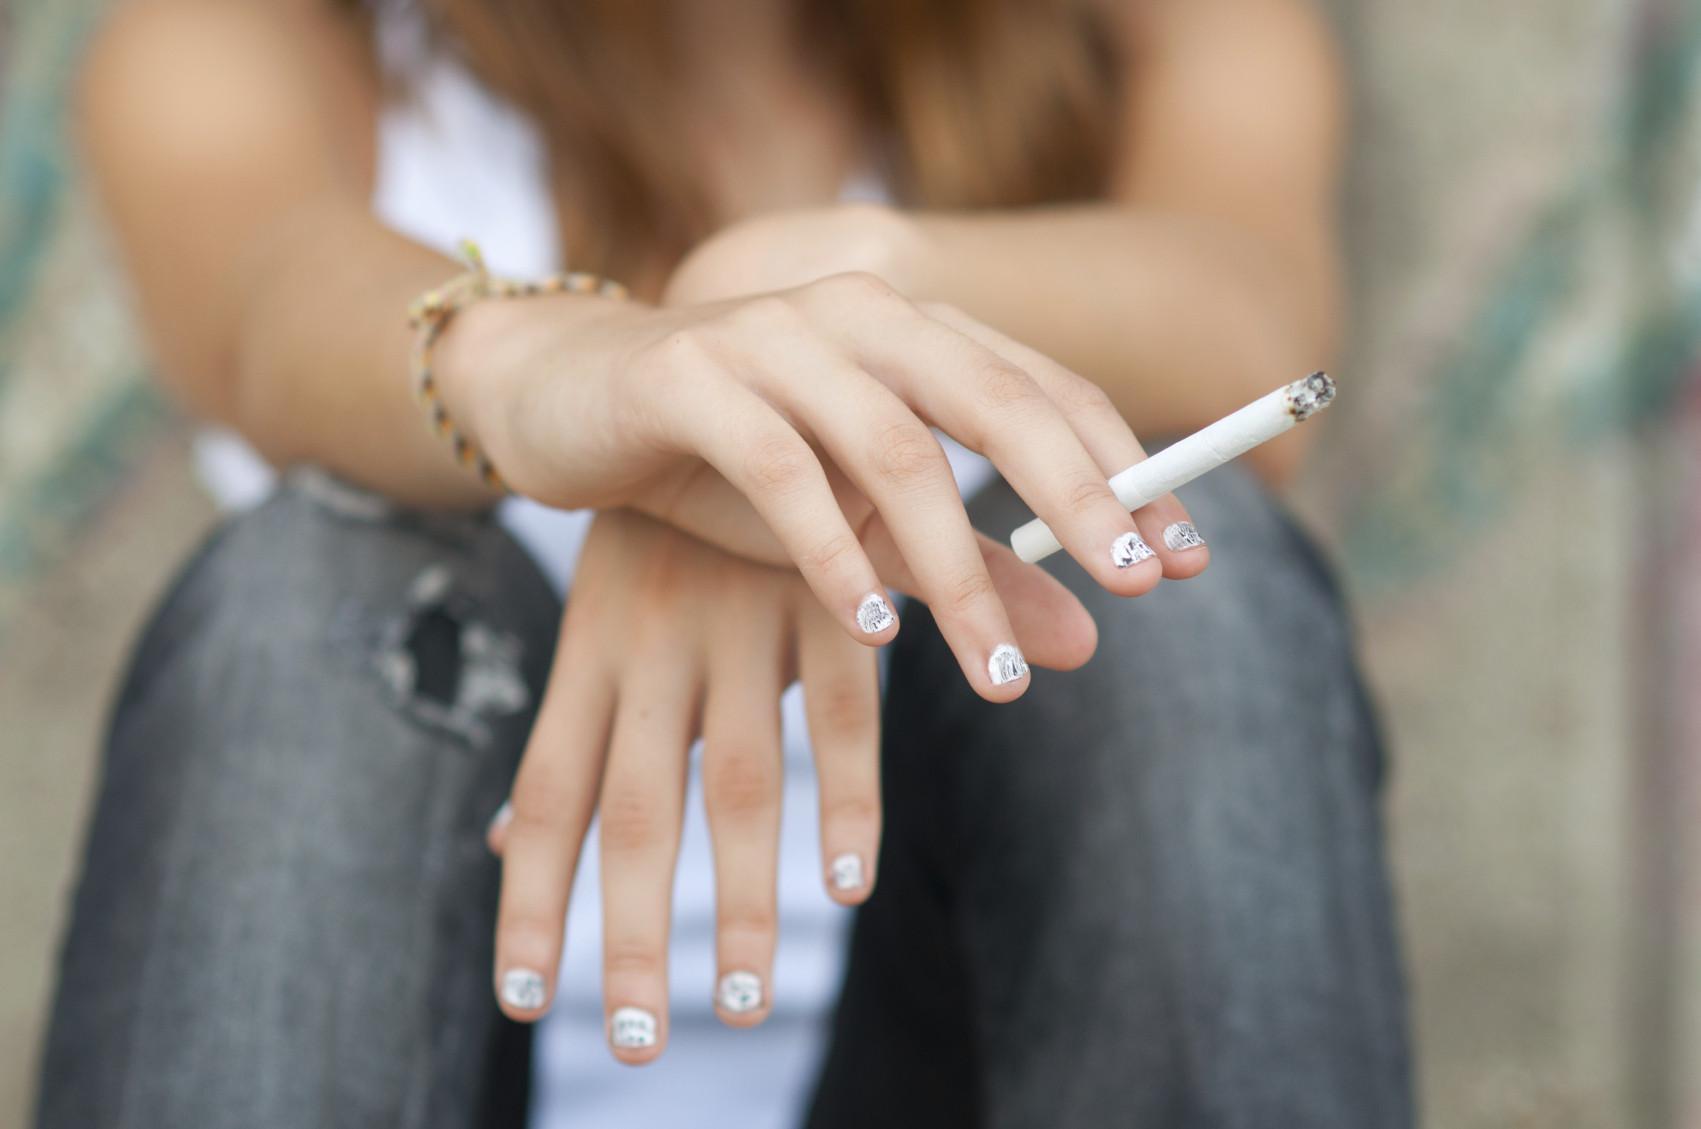 teen-smoking-cigarette-quit-tobacco21-lawsiStock_000023225544_Medium